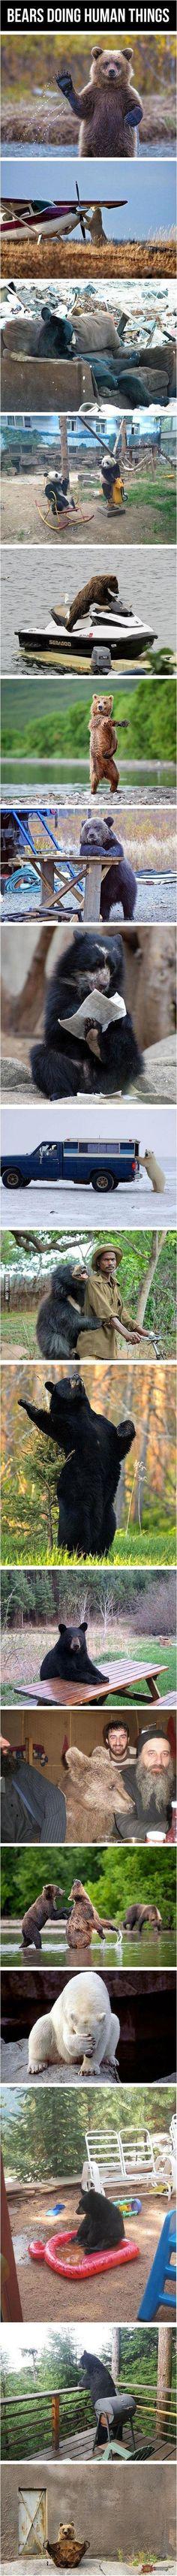 to be a bear or not to be a bear that's the question